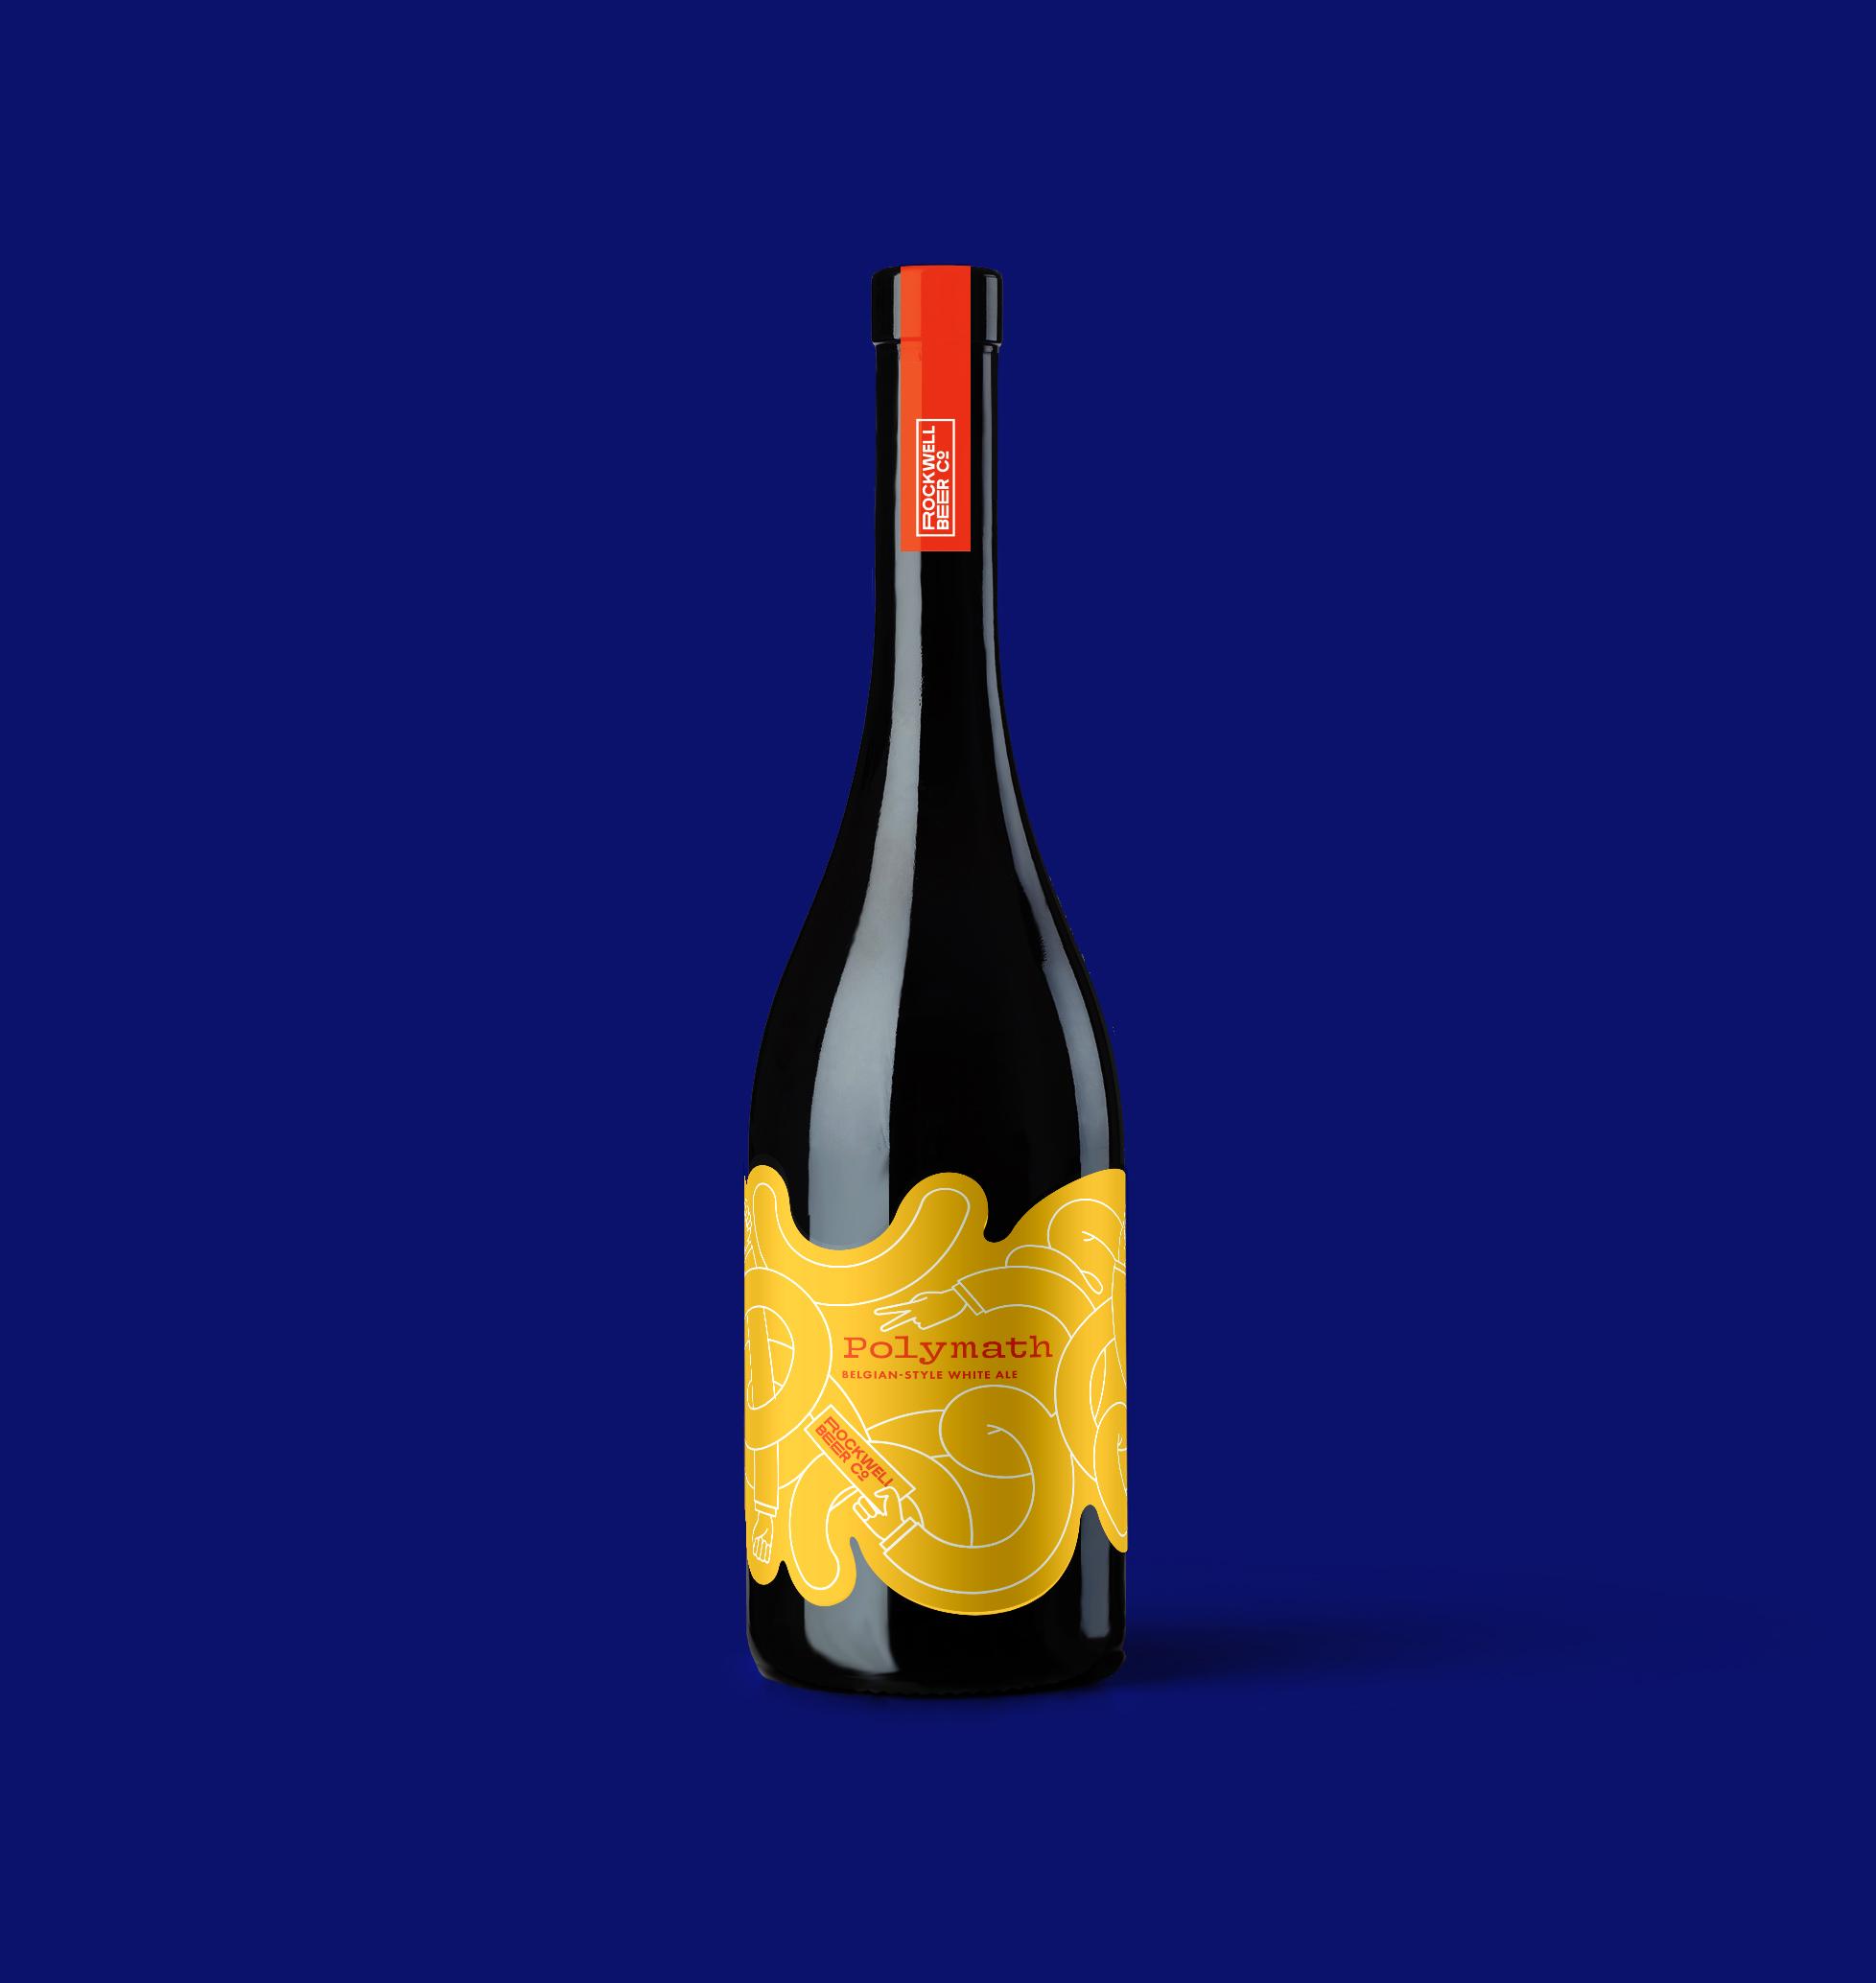 Photo of Rockwell Polymath bottle design